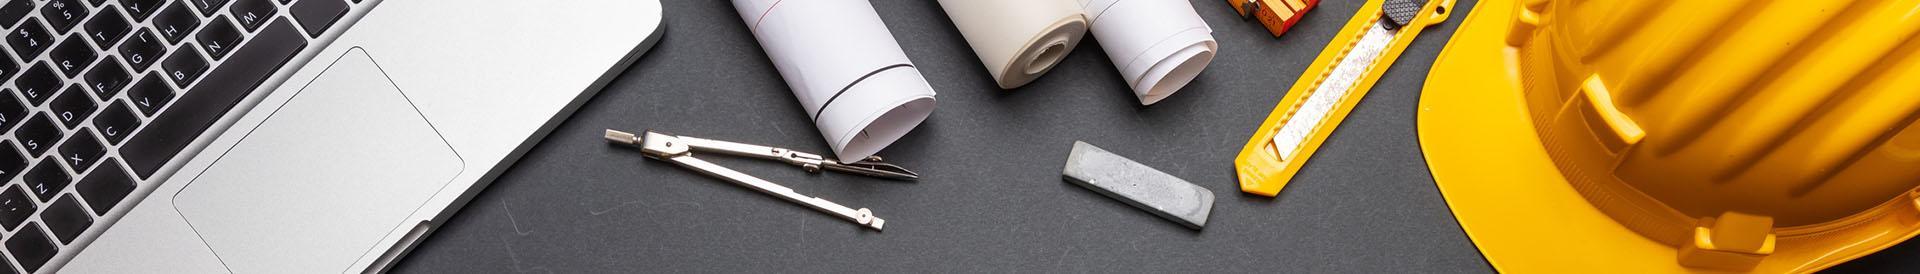 Laptop, kask, cyrkiel, arkusze papieru, nóż introligatorski